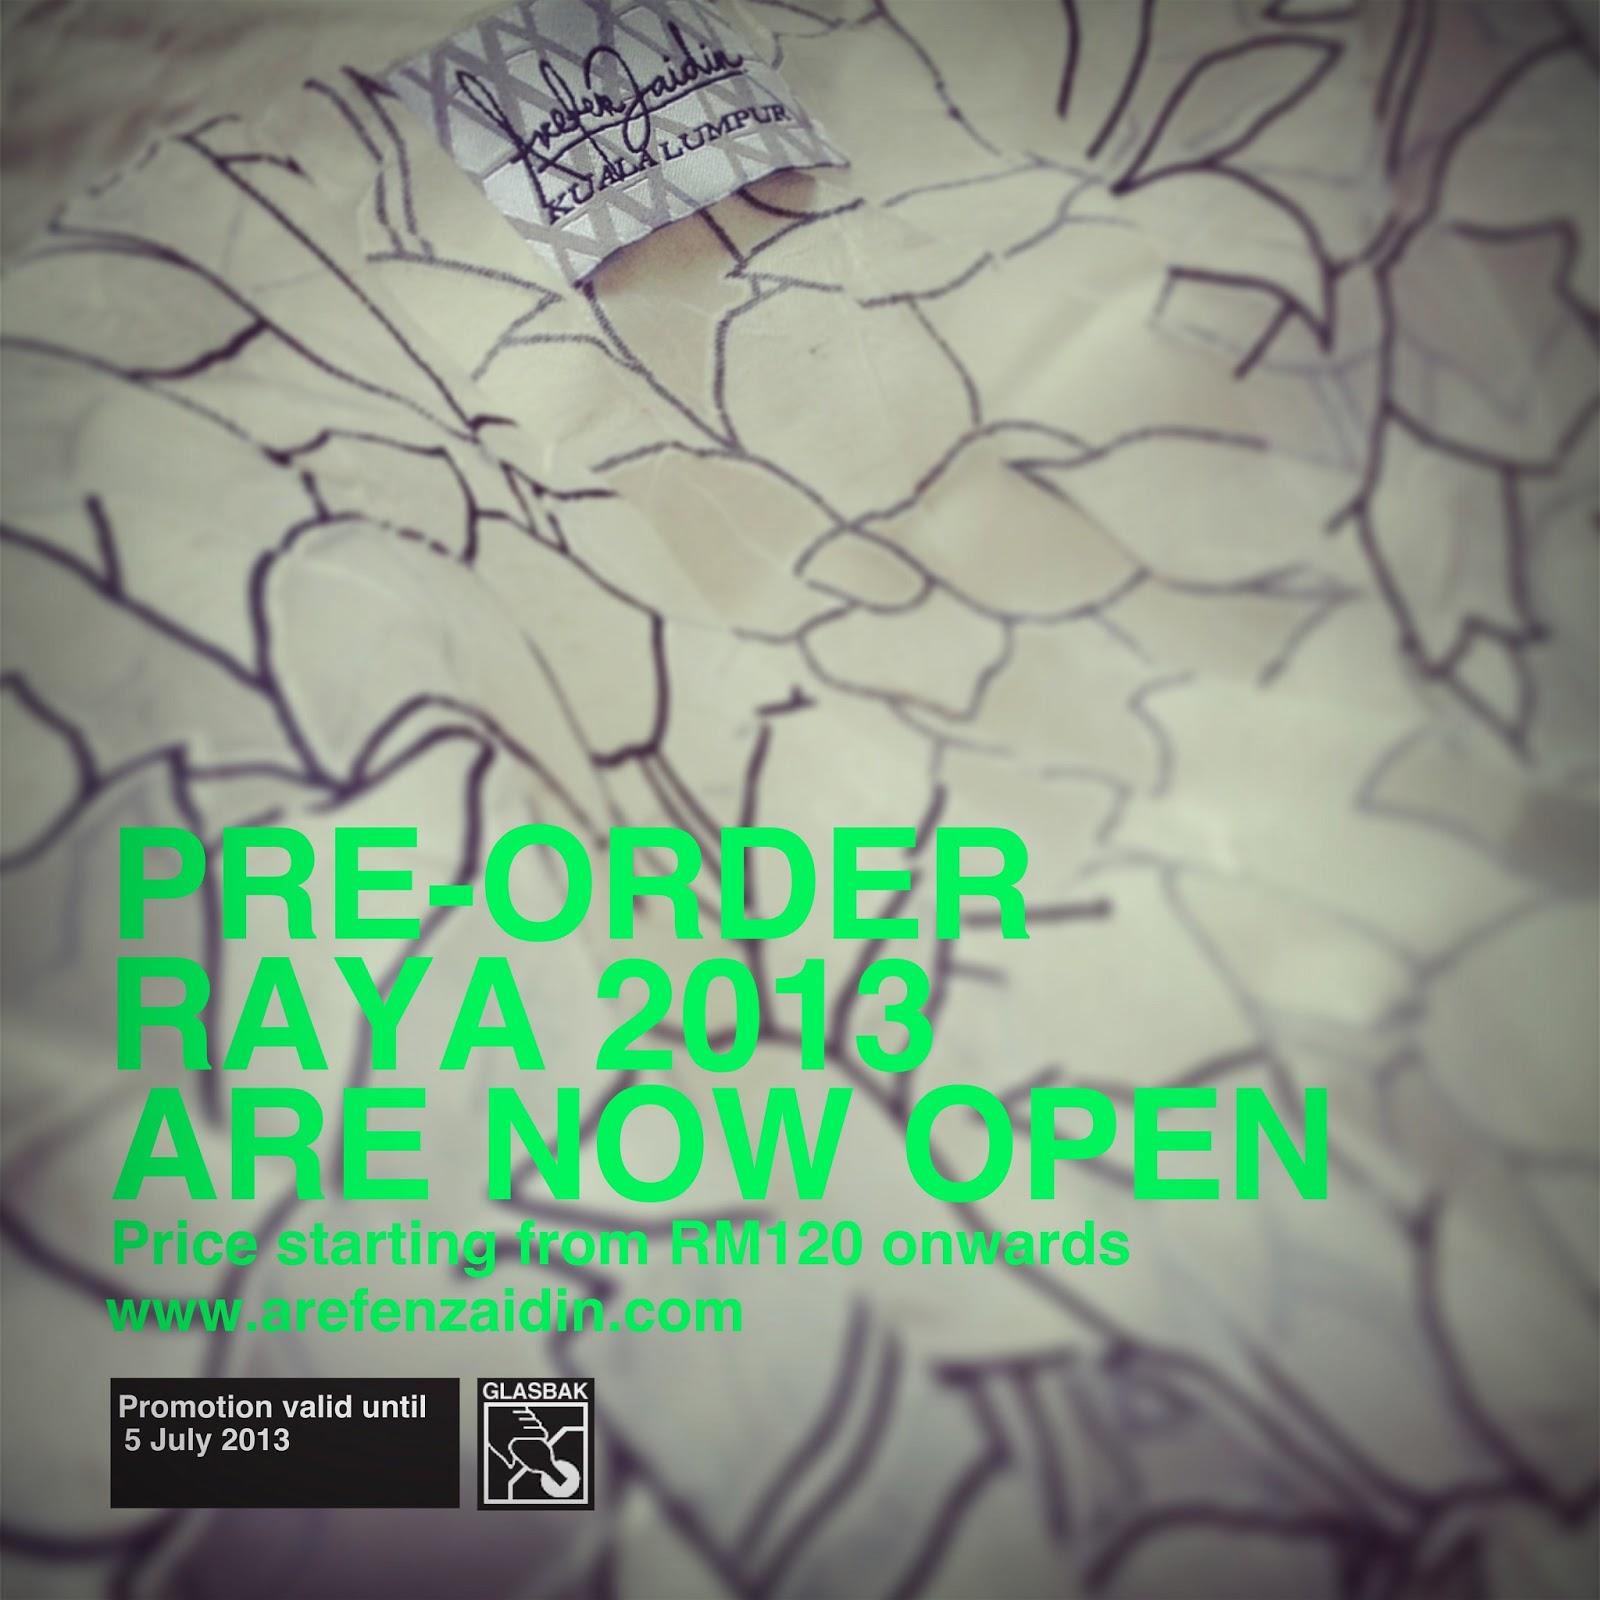 Raya 2013 pre-order